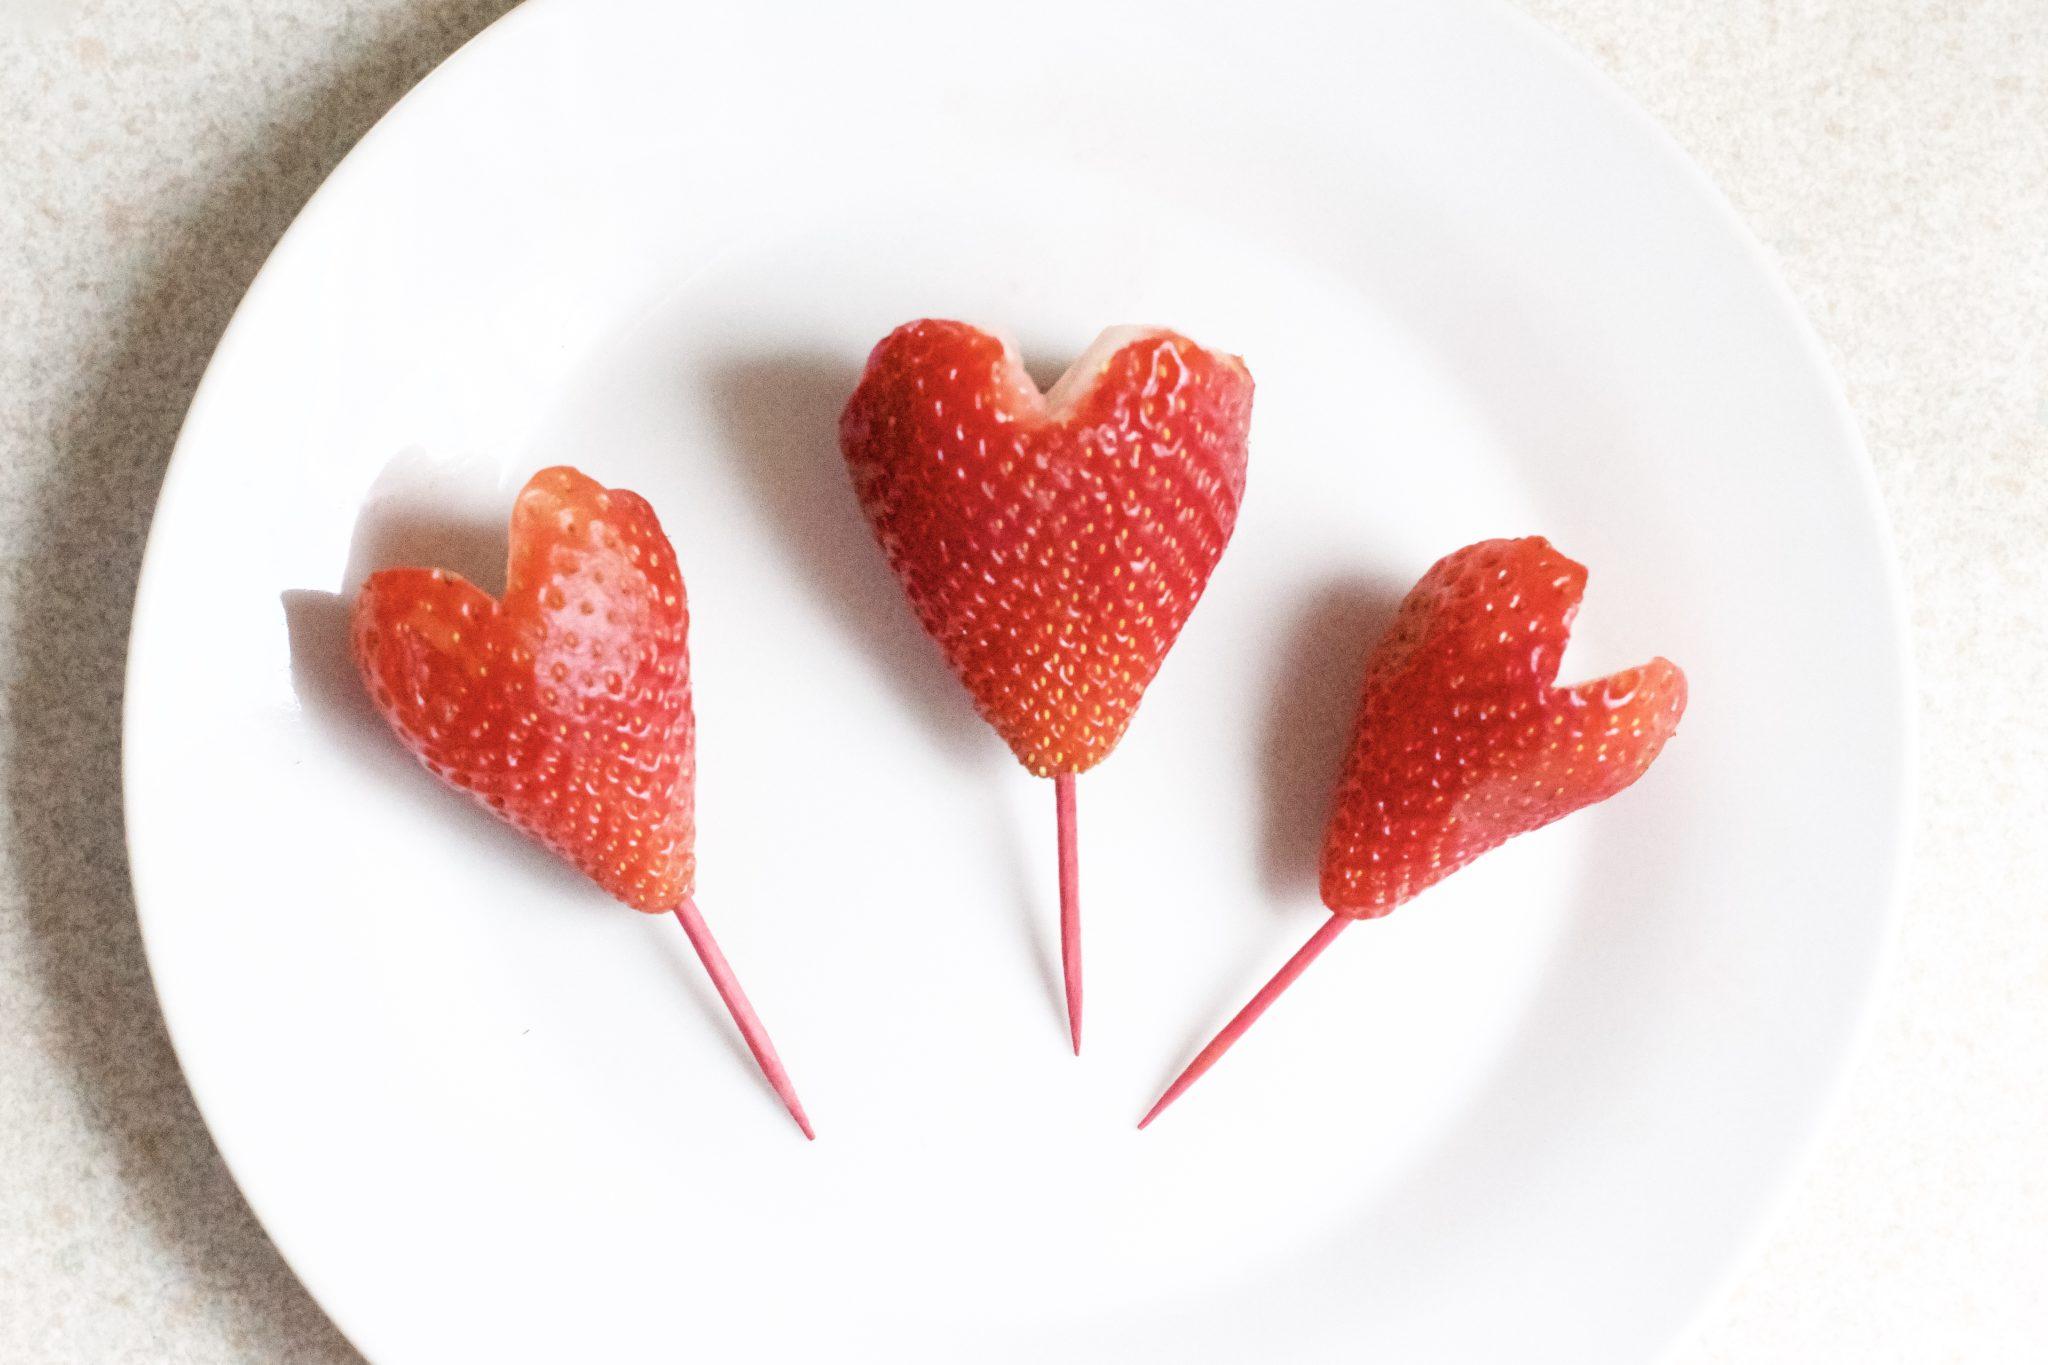 Chocolate Strawberry Valentine's Day Hearts (Vegan, Gluten-Free)